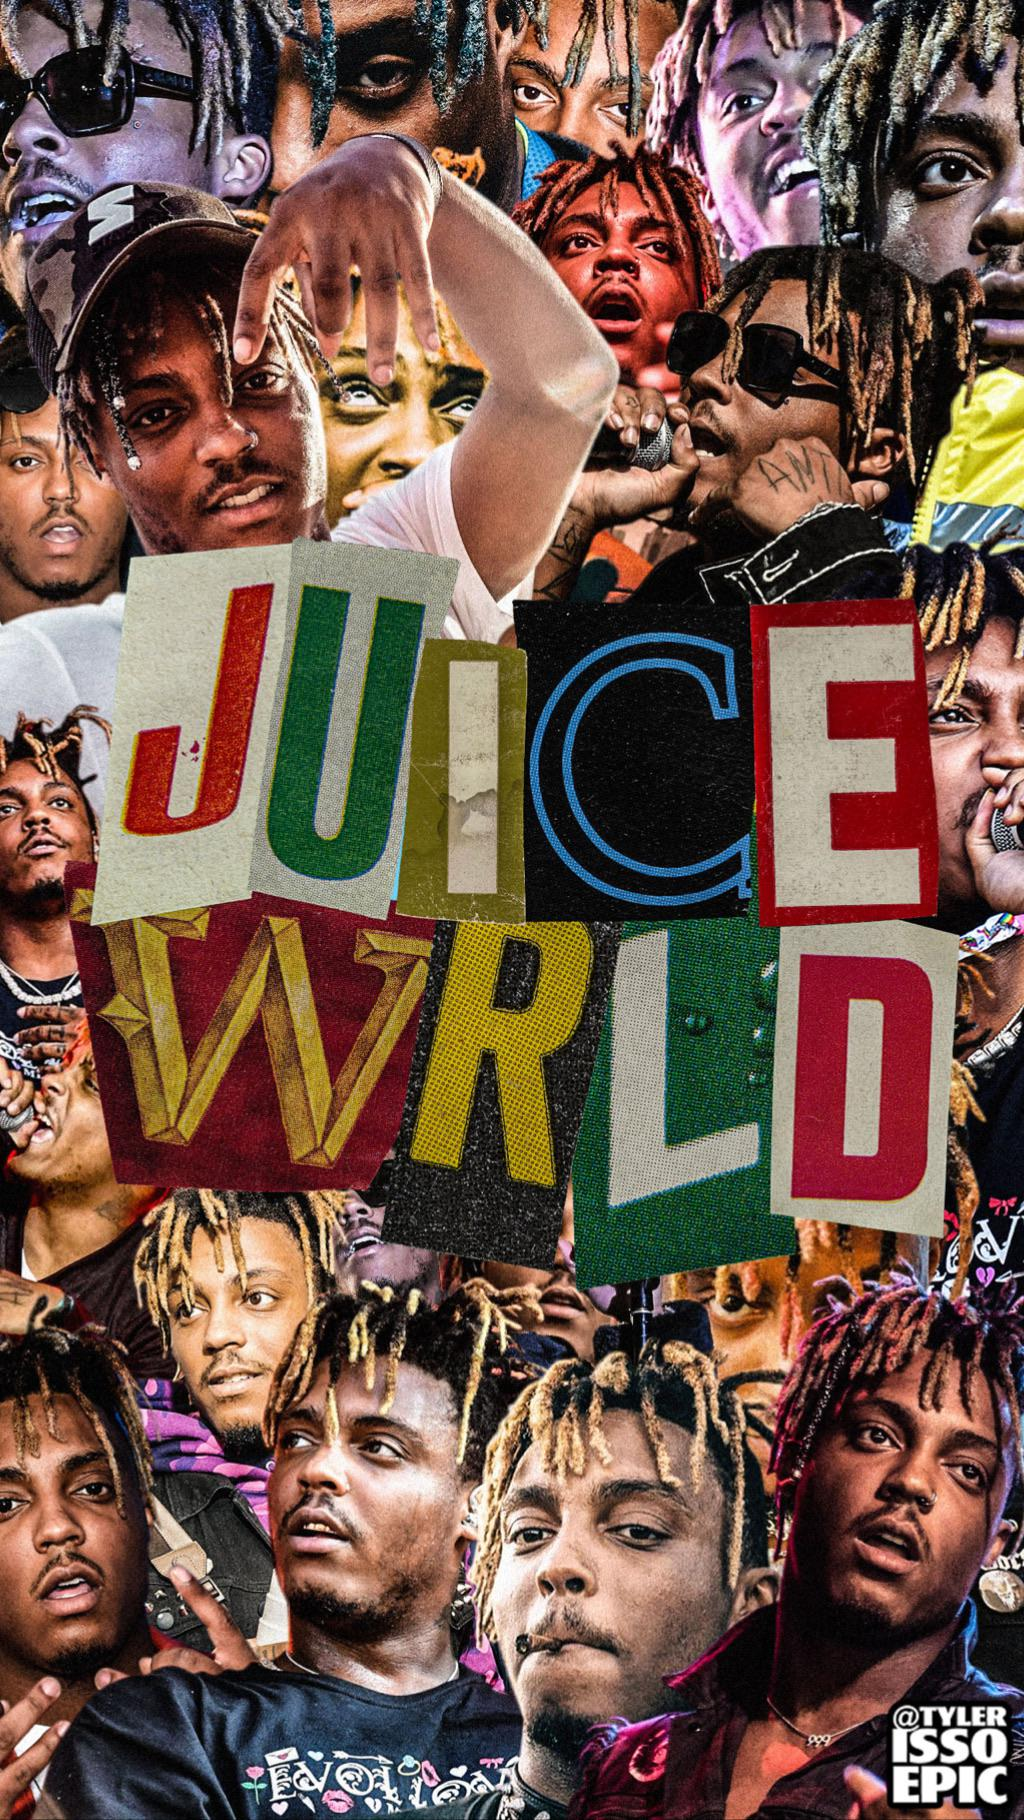 Juice Wrld Aesthetic Wallpapers - Wallpaper Cave